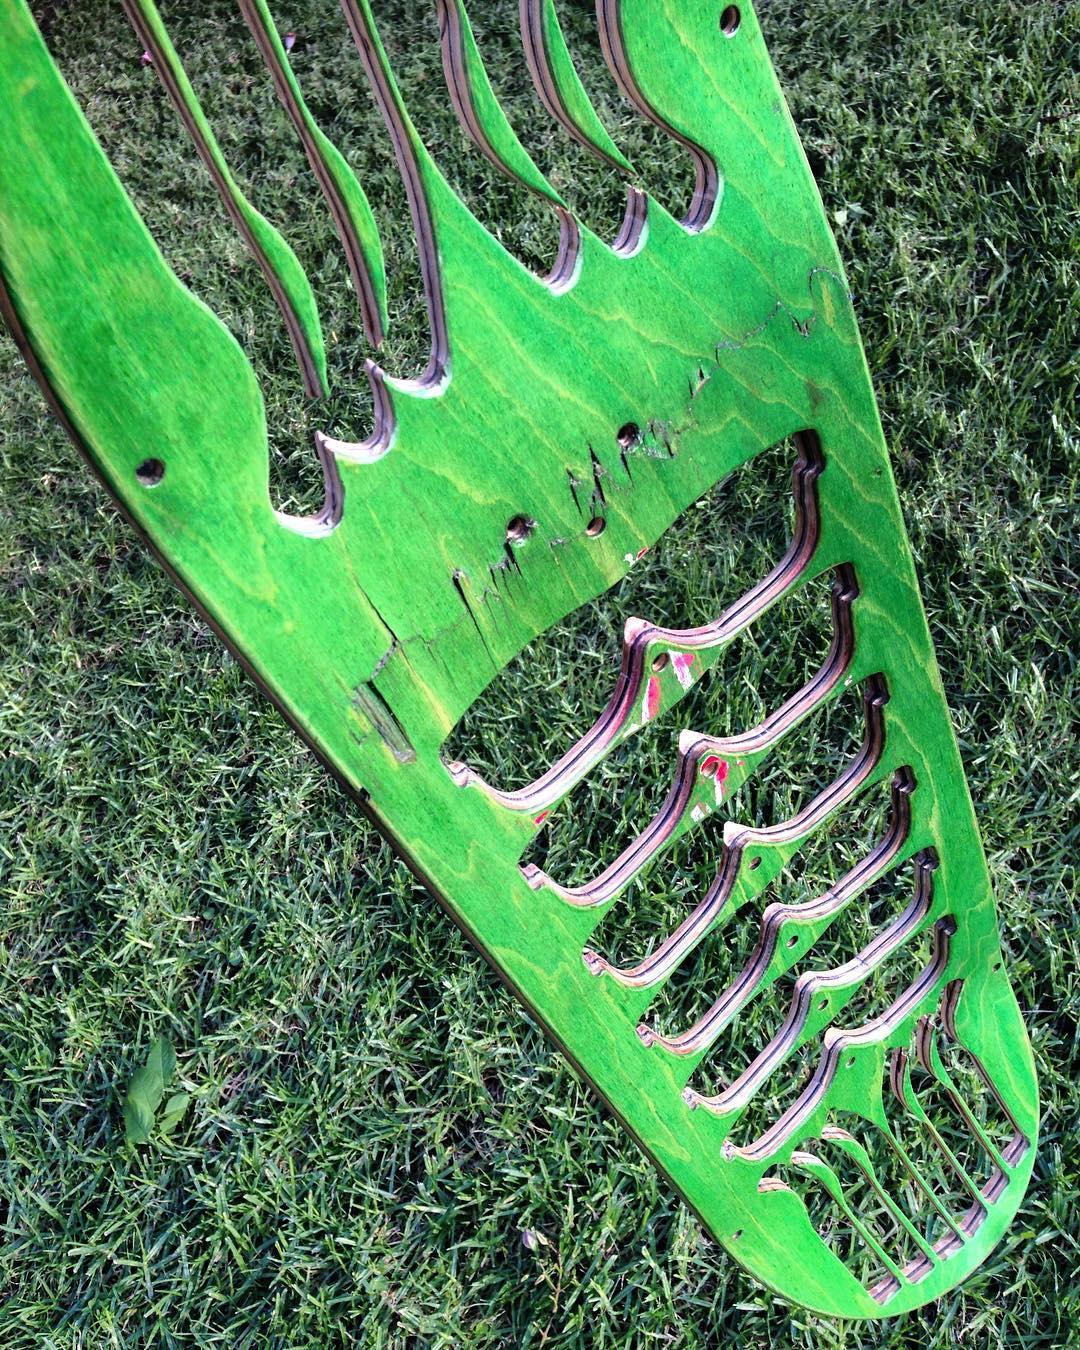 ♻️♻️ Así como trabajamos artesanalmente los anteojos , también trabajamos las tablas ♻️♻️ #art #skate #recycledwood #recycledskateboards #recycledsunglasses #skateart #sunglasses #recycled